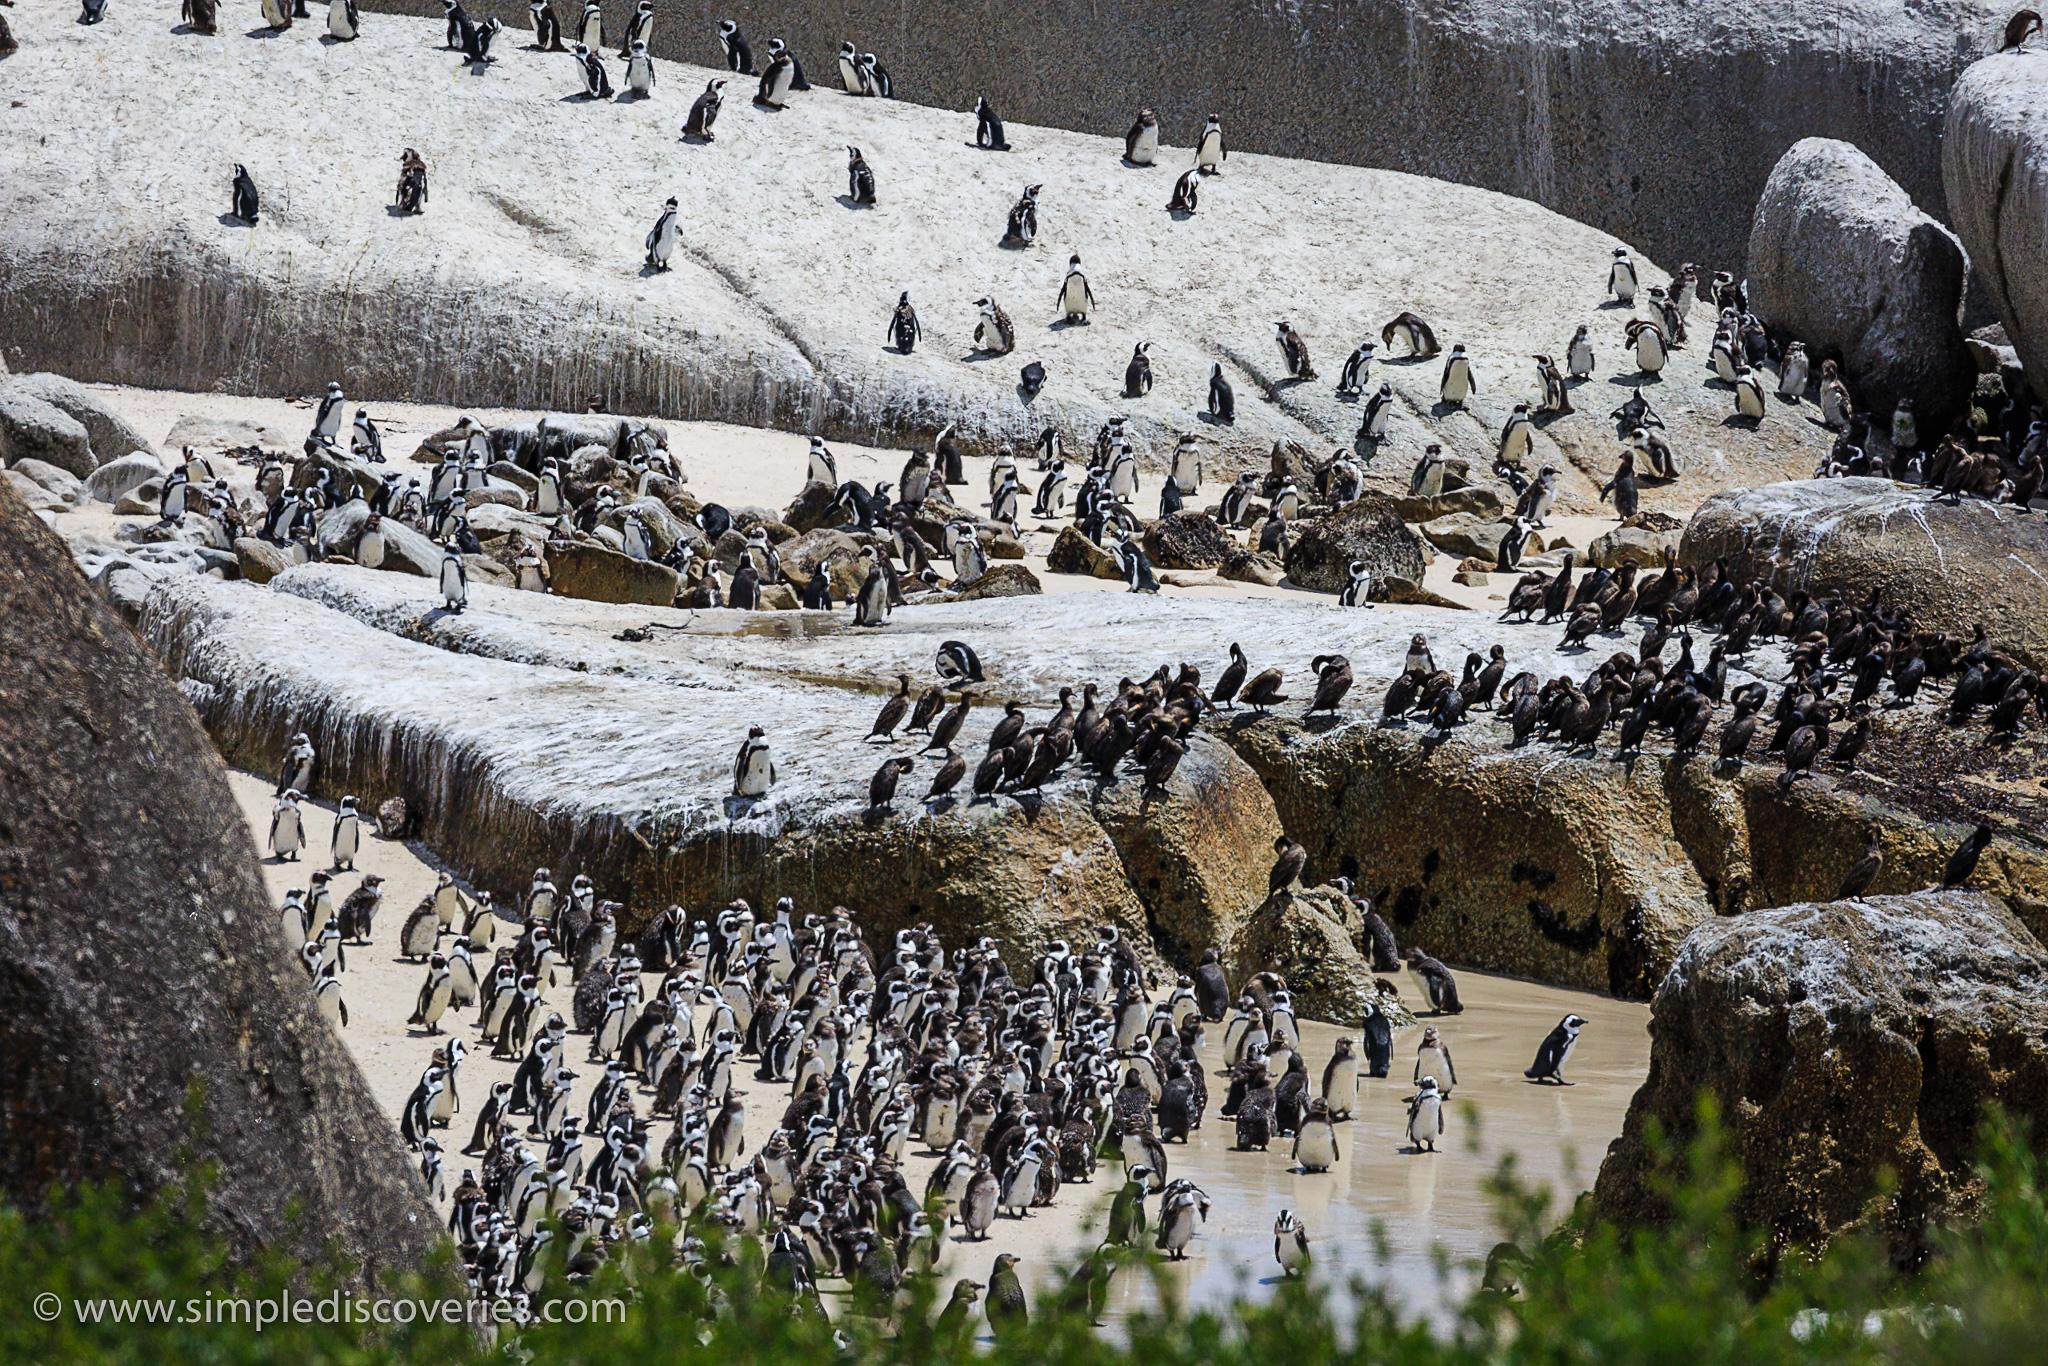 boulders_beach_penguin_colony